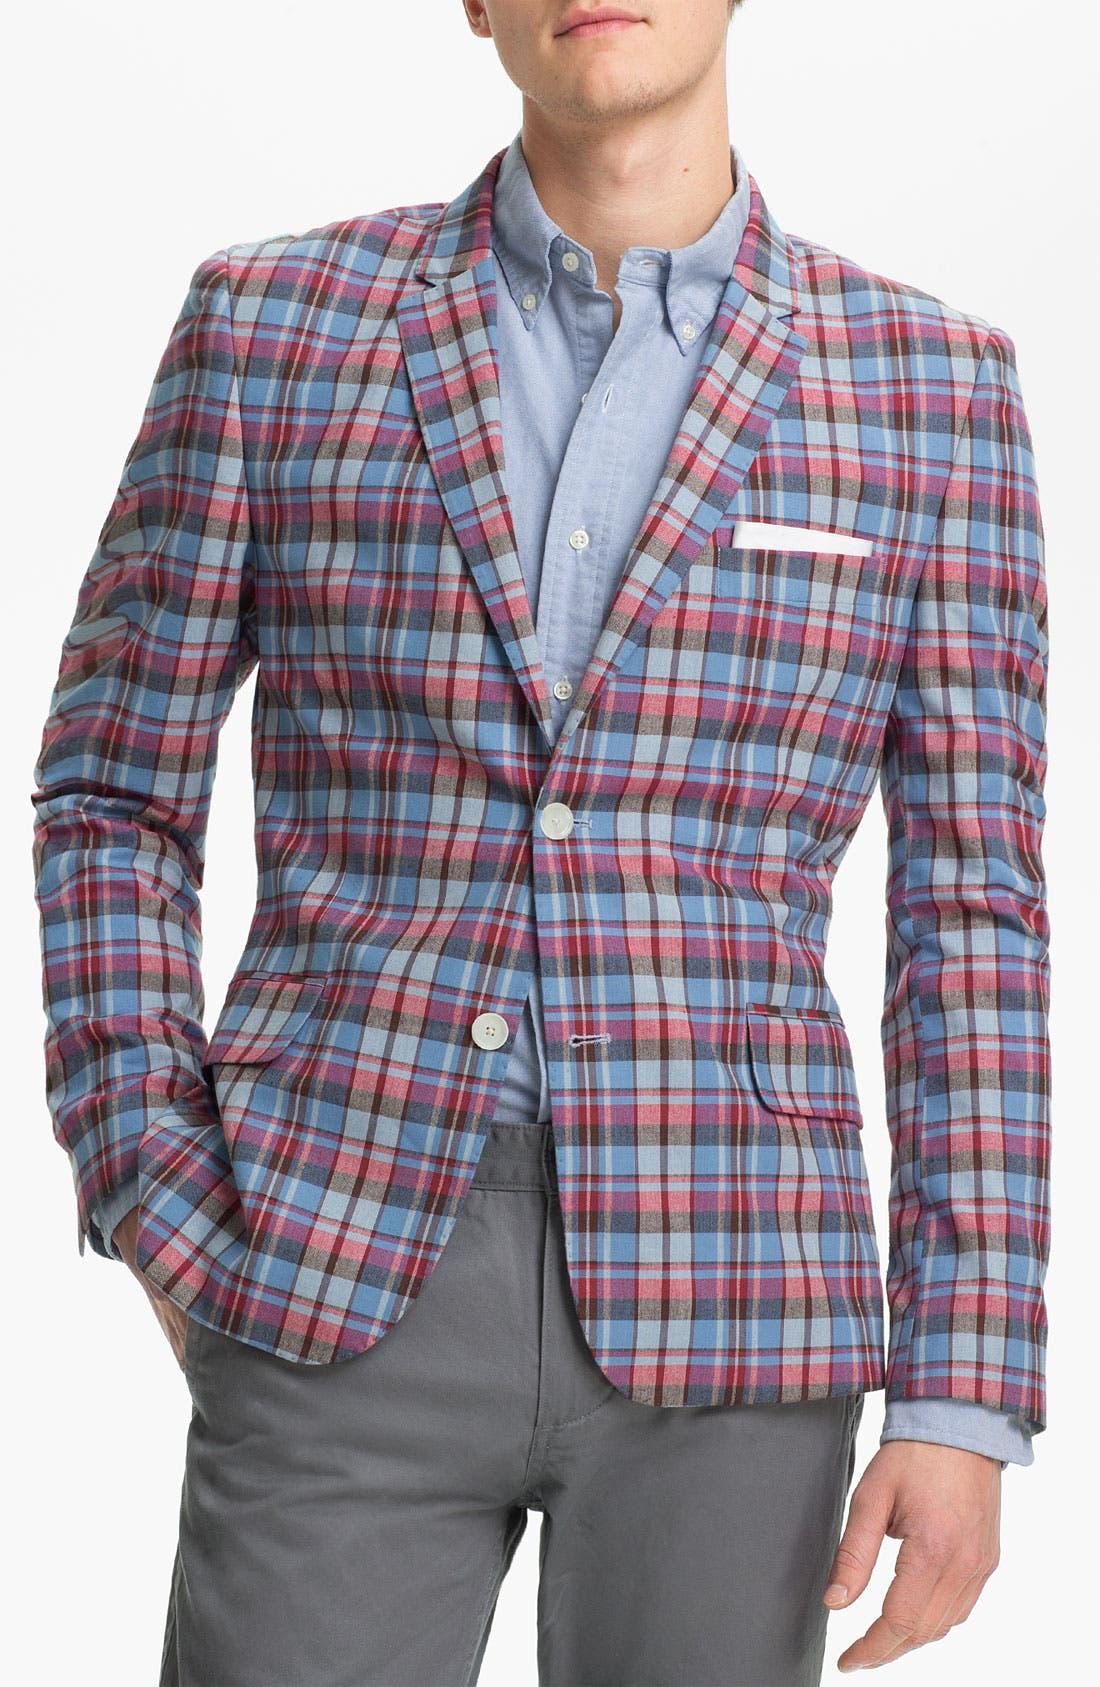 Alternate Image 1 Selected - John W. Nordstrom® Madras Cotton Sportcoat